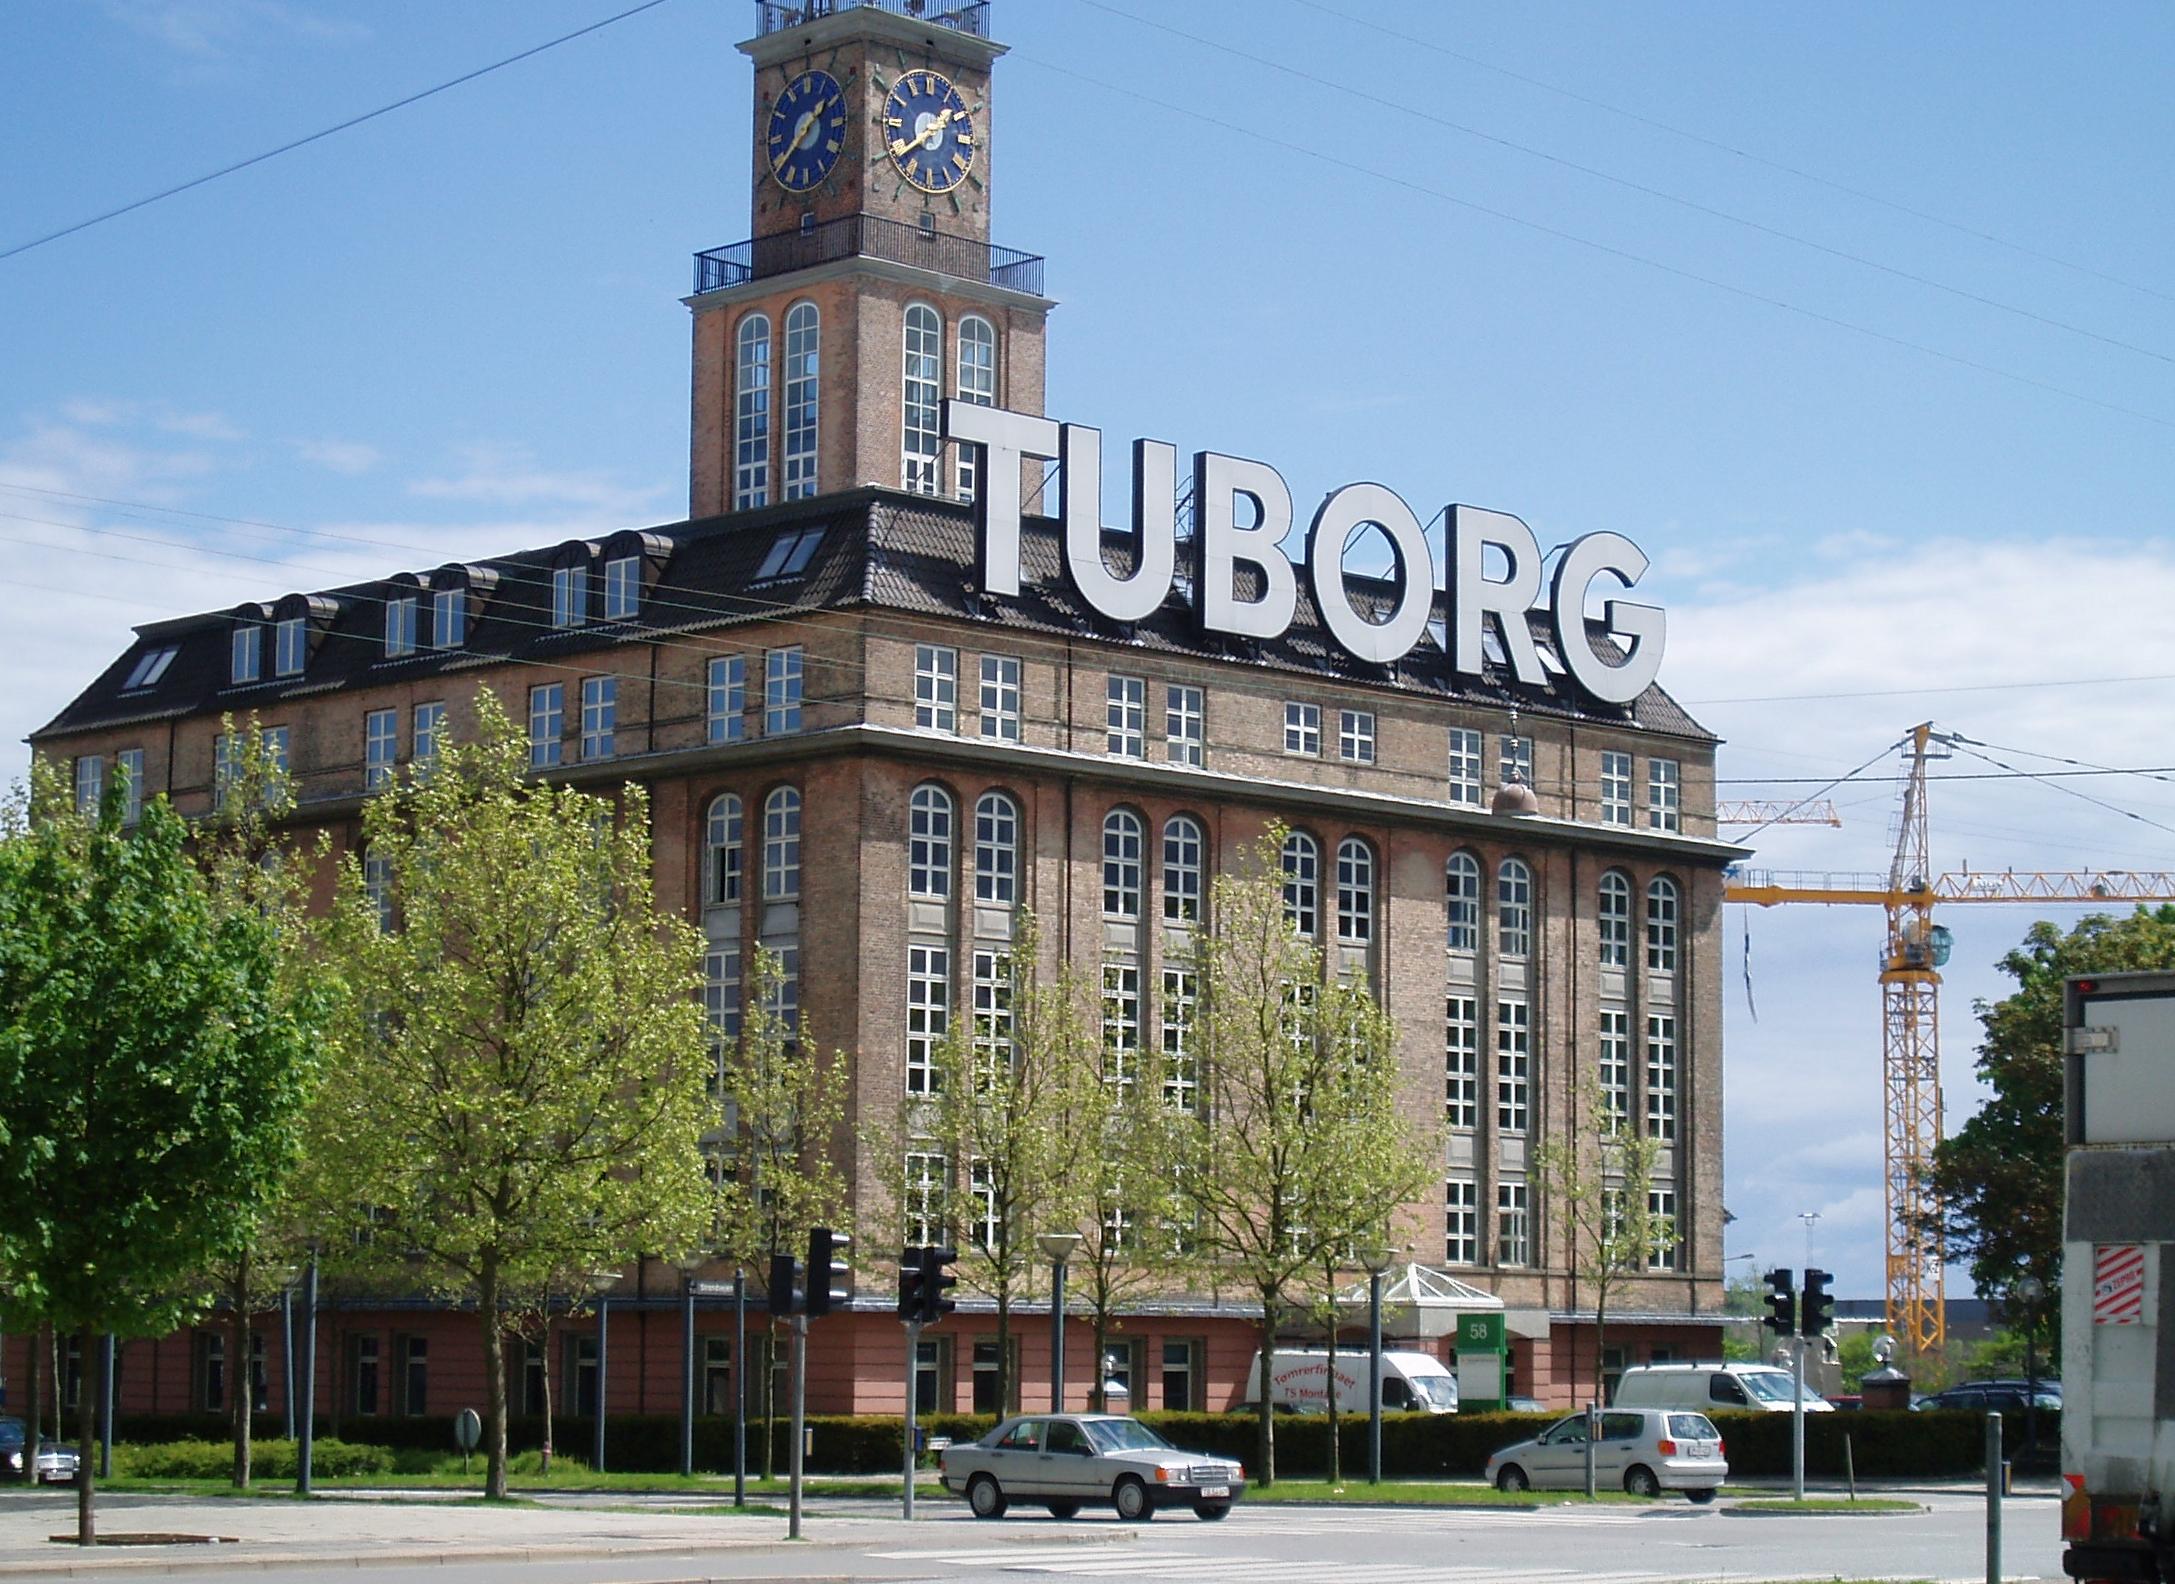 http://upload.wikimedia.org/wikipedia/commons/a/ad/Tuborg.jpg